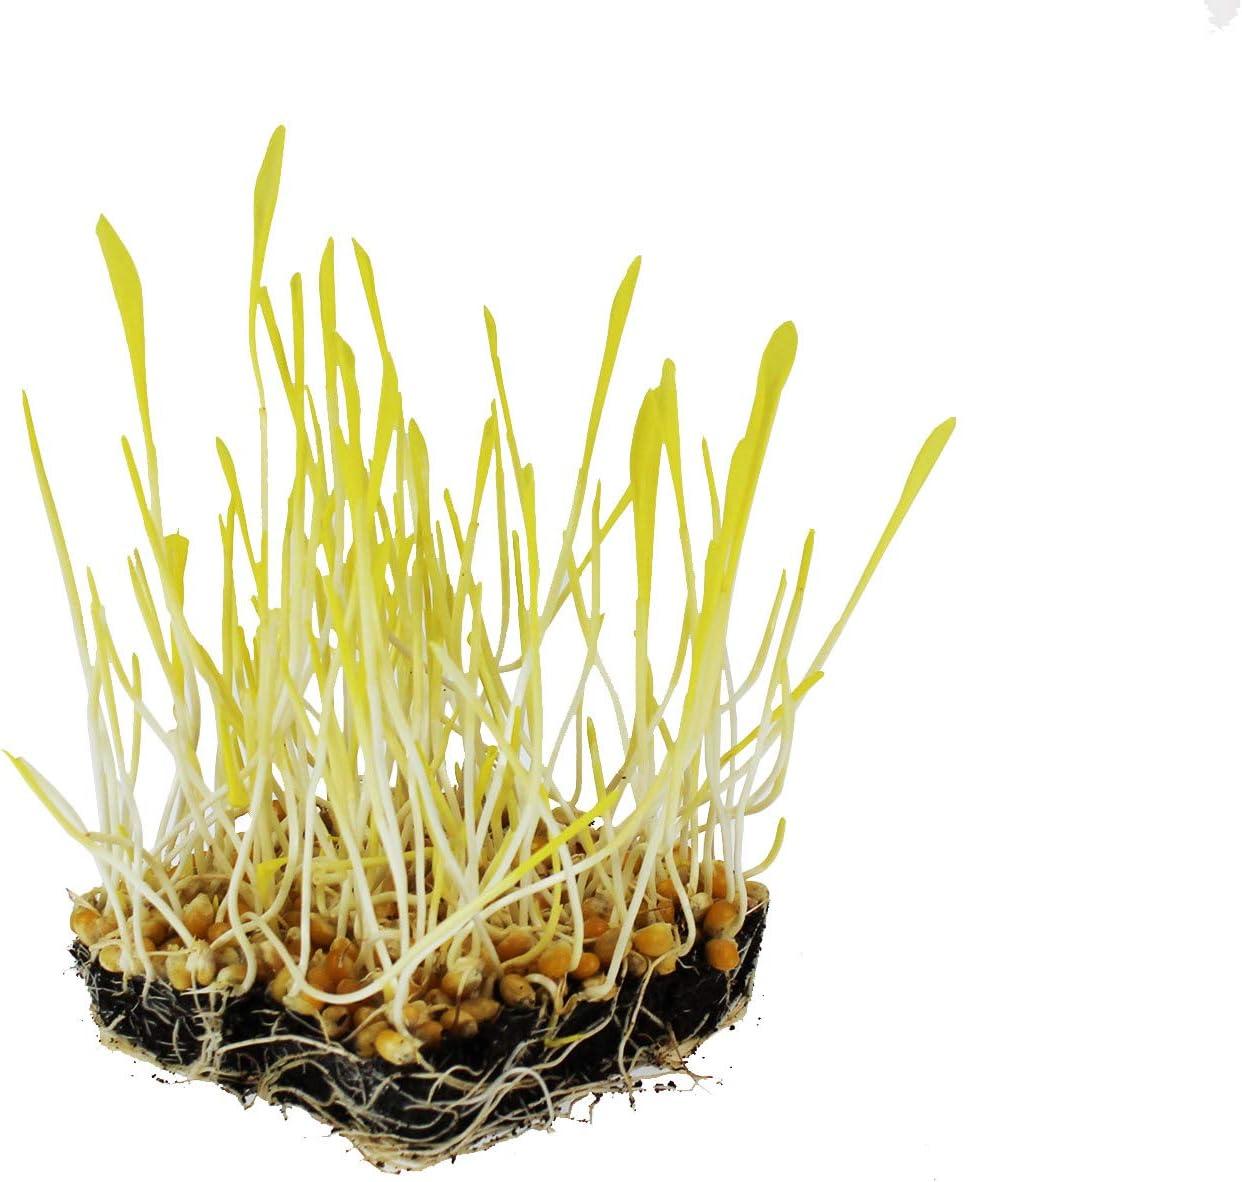 Yellow Popcorn Garden Seeds - 10 g Packet ~50 Seeds - Non-GMO, Organic, Heirloom Vegetable Gardening & Microgreens Seeds - Pop Corn